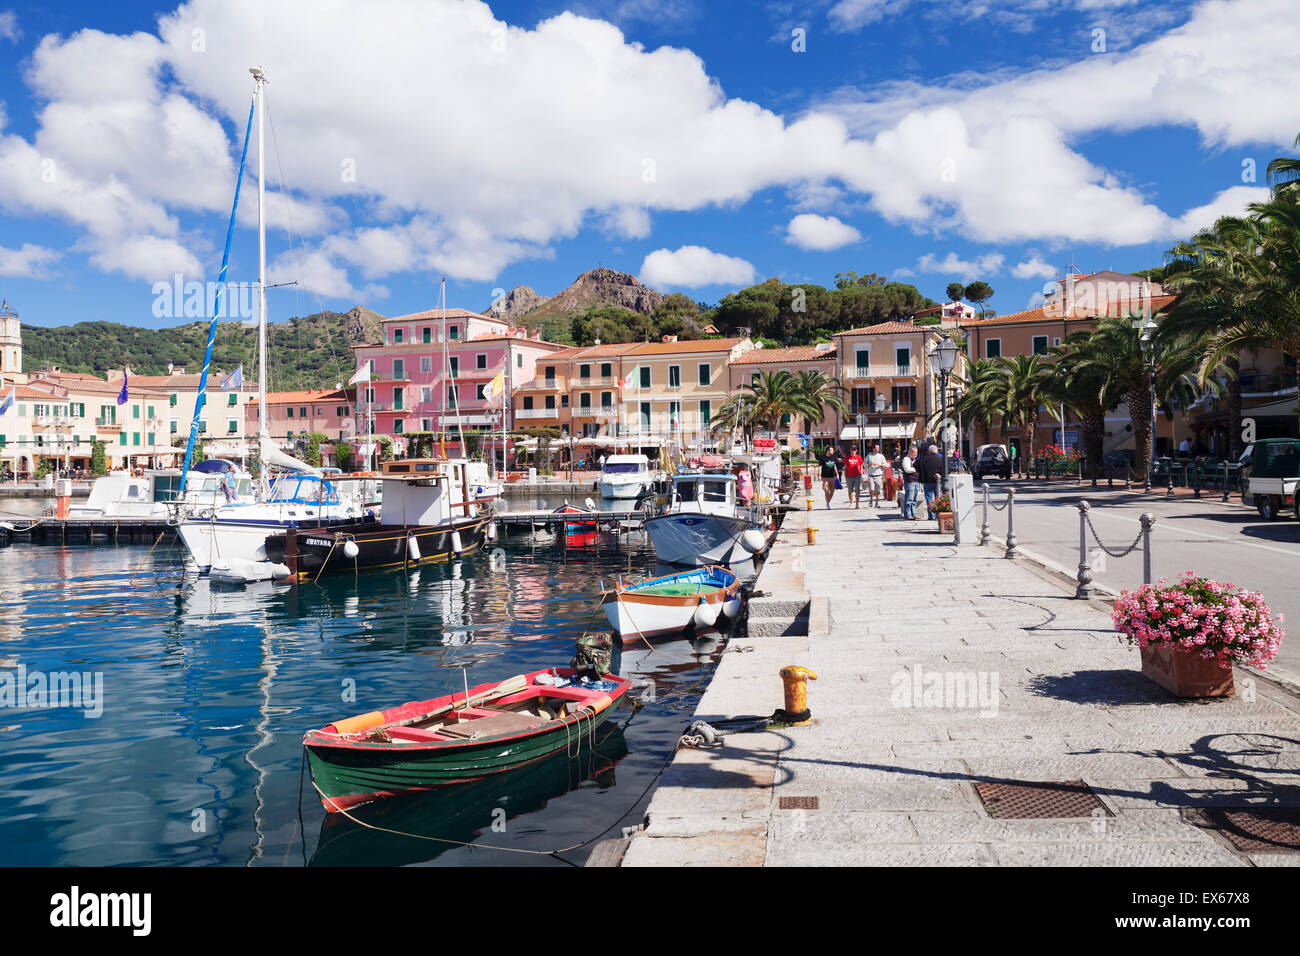 Harbour of Porto Azzurro, Elba, Livorno, Tuscany, Italy - Stock Image